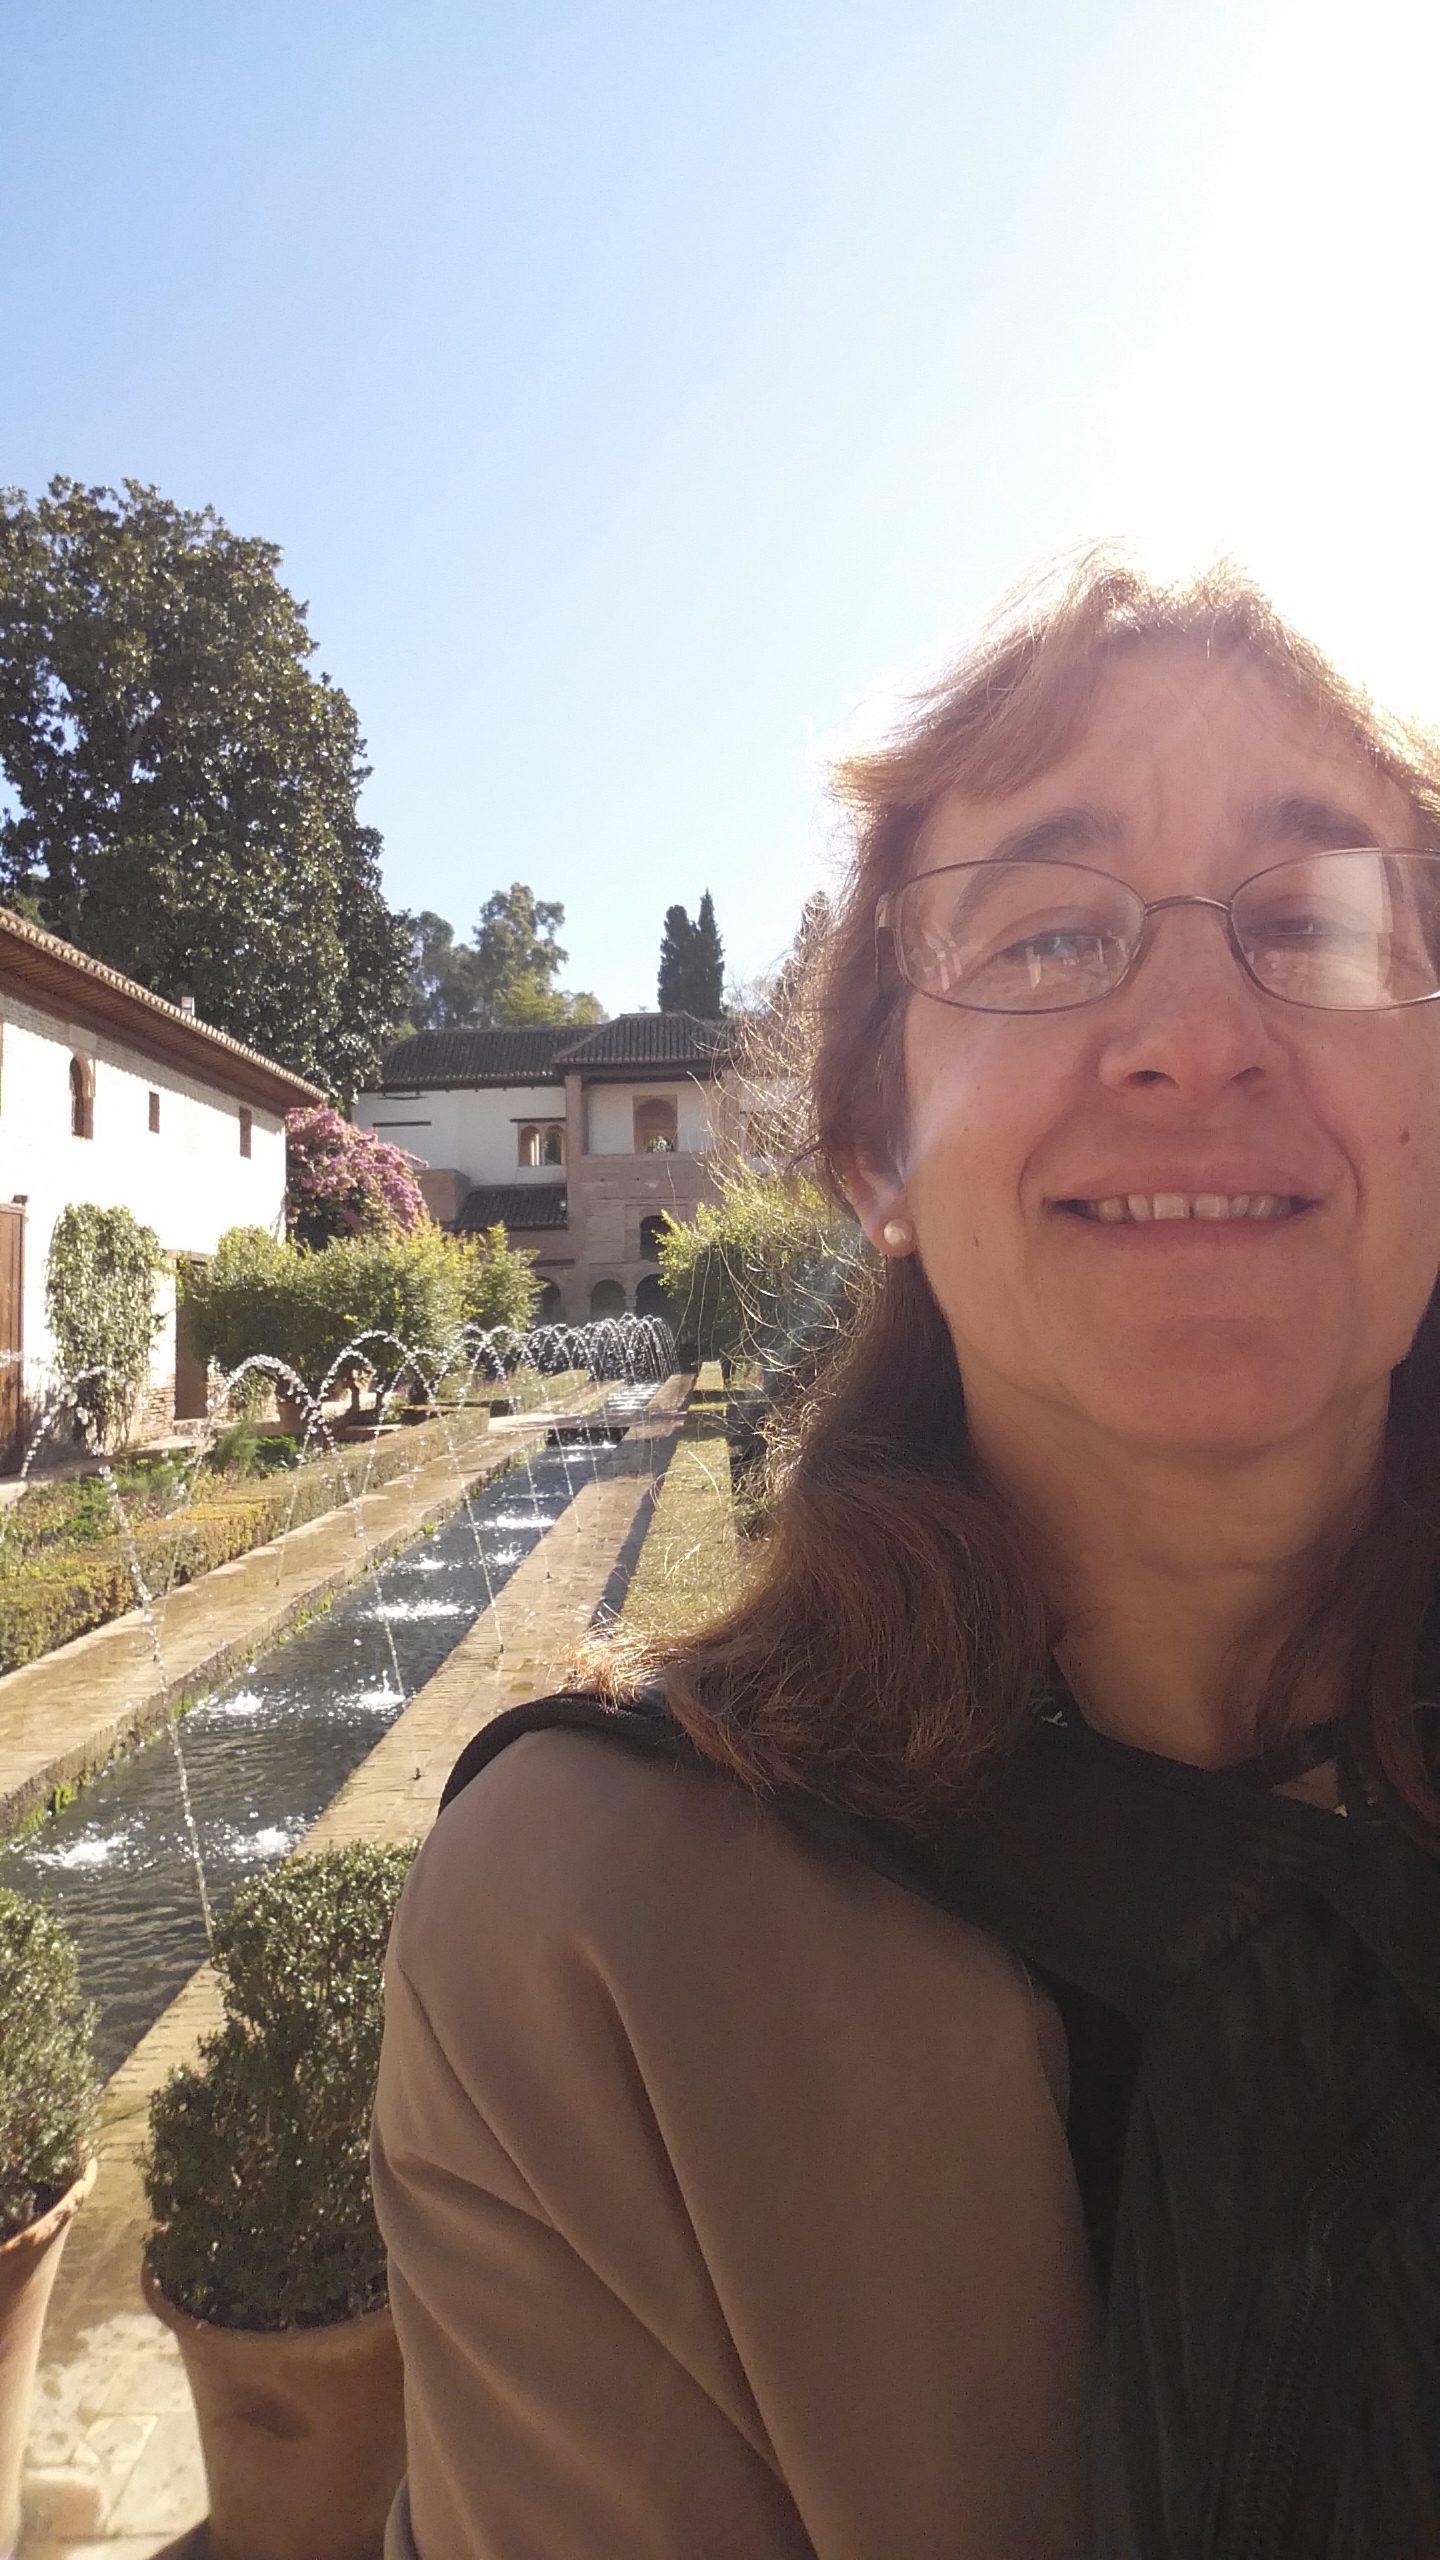 Author in La Alhambra, Spain